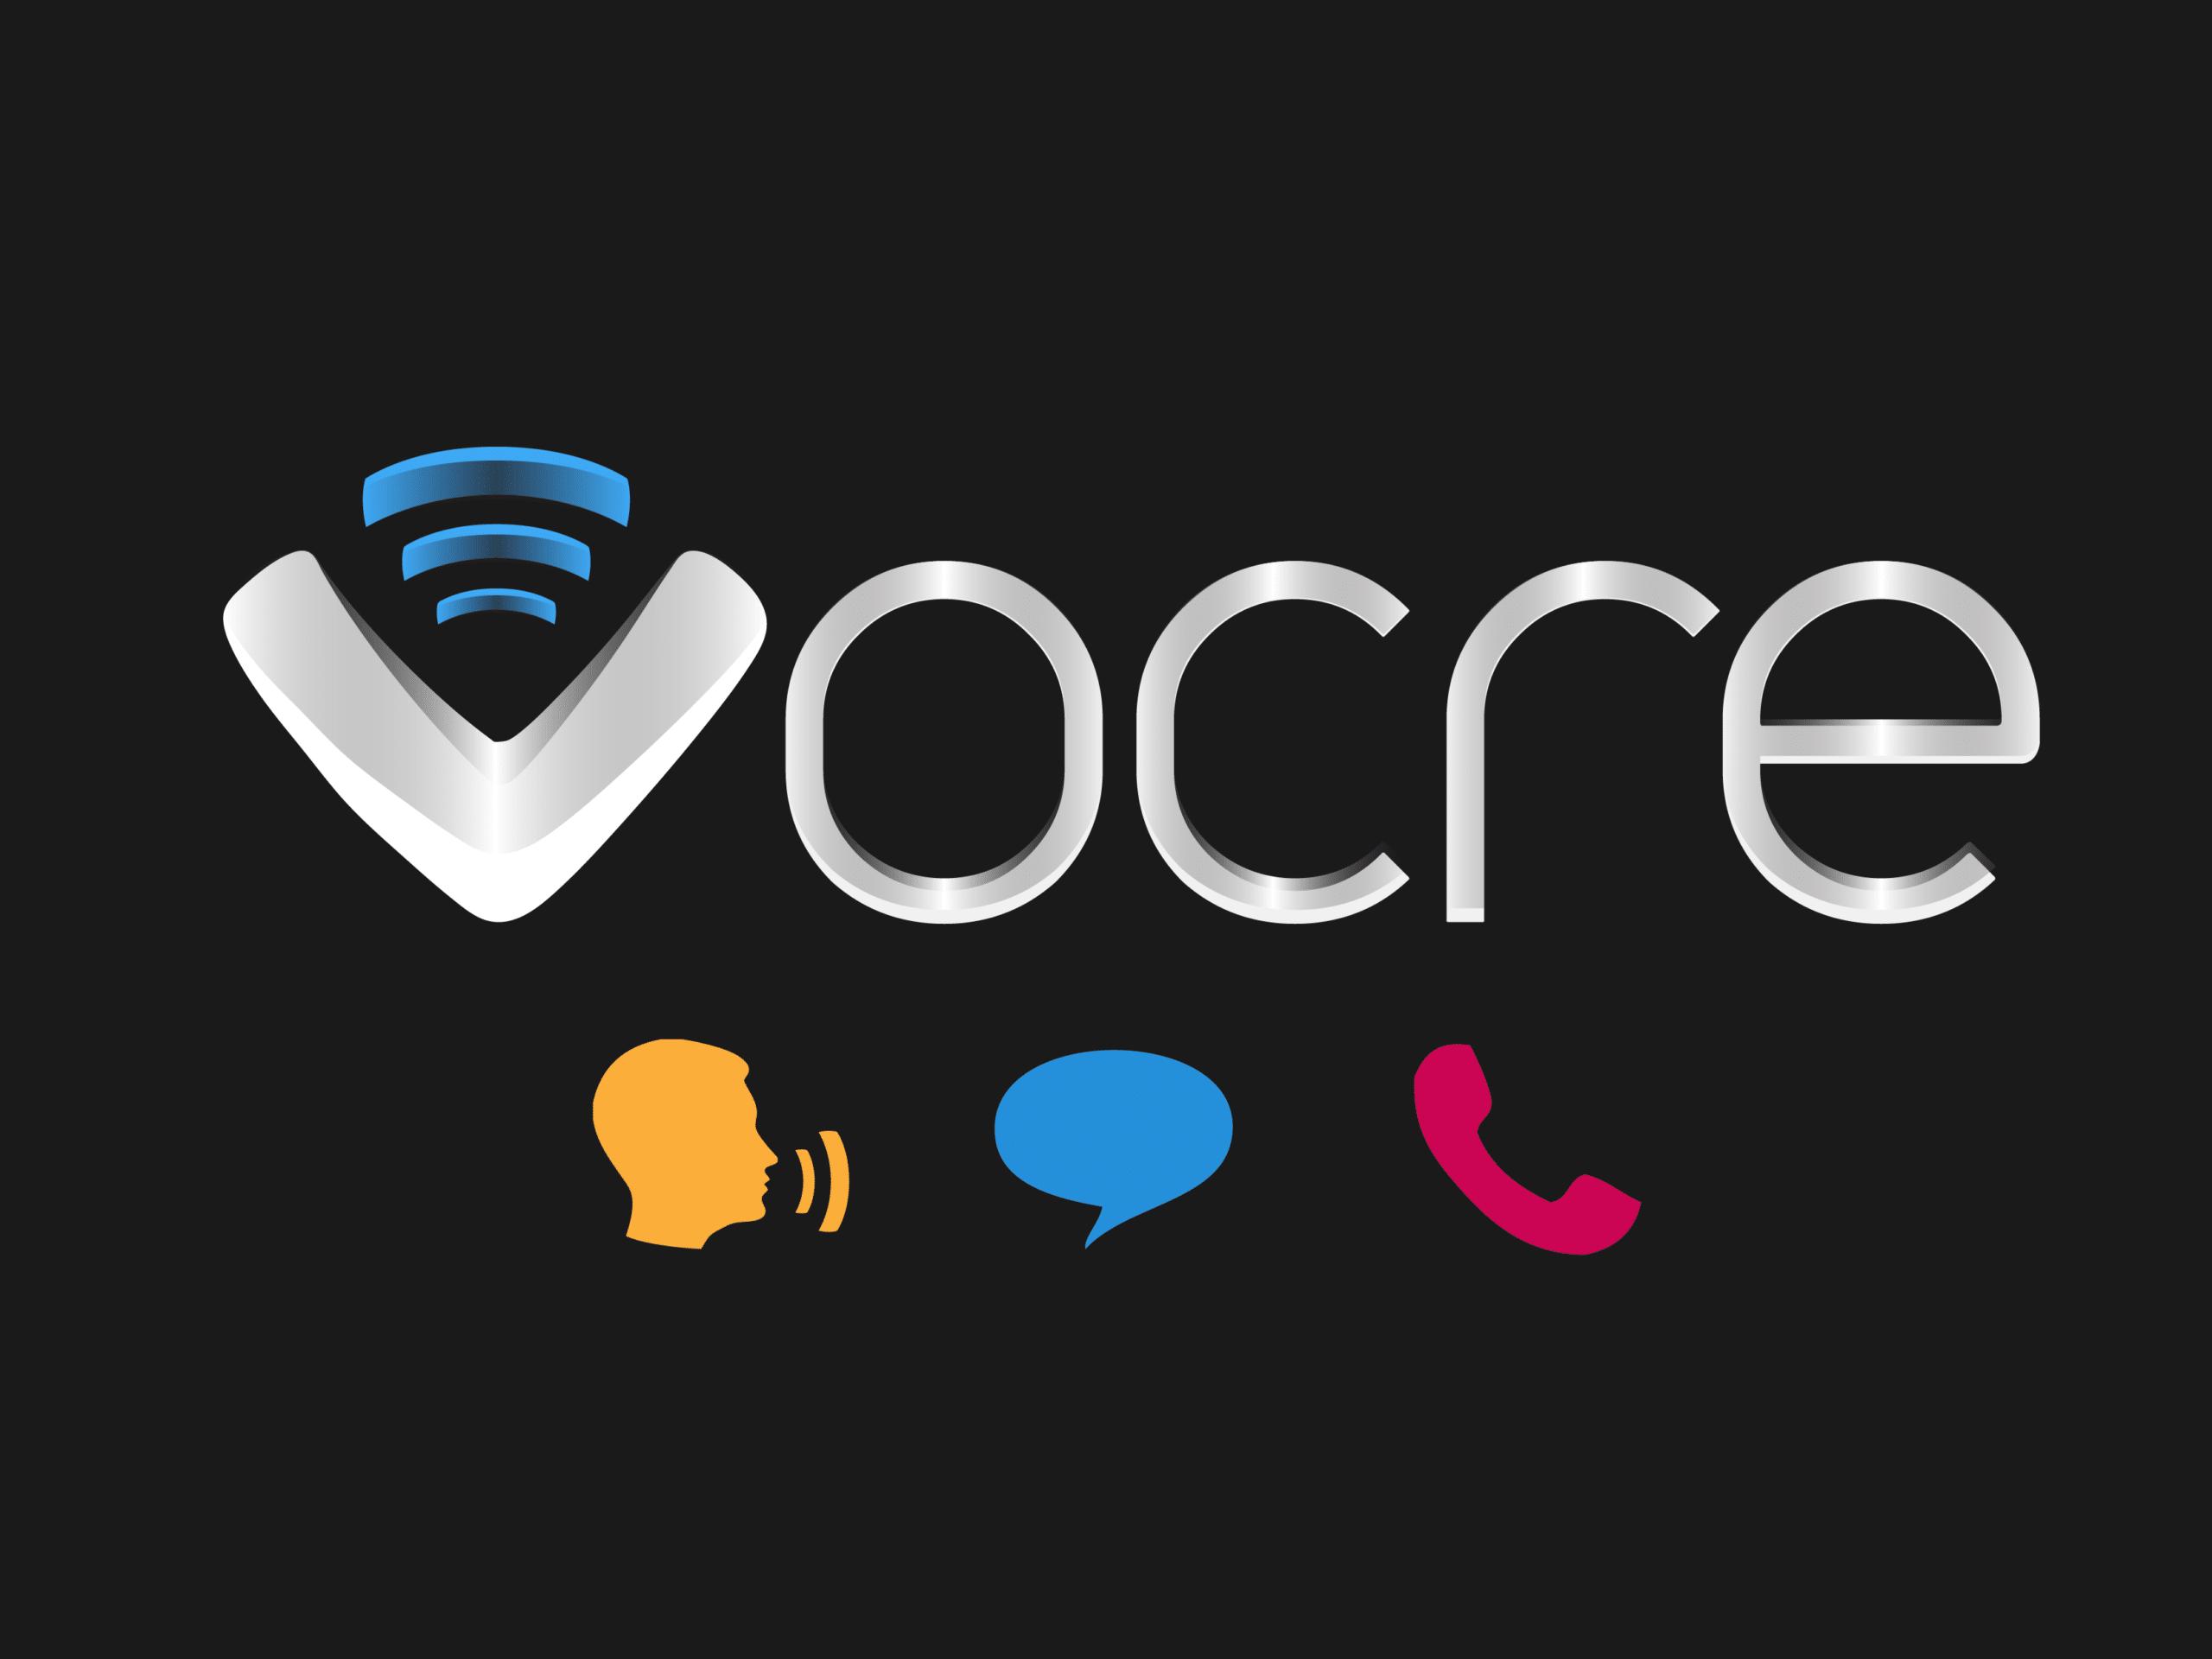 vocre-logo-2012-avrmagazine